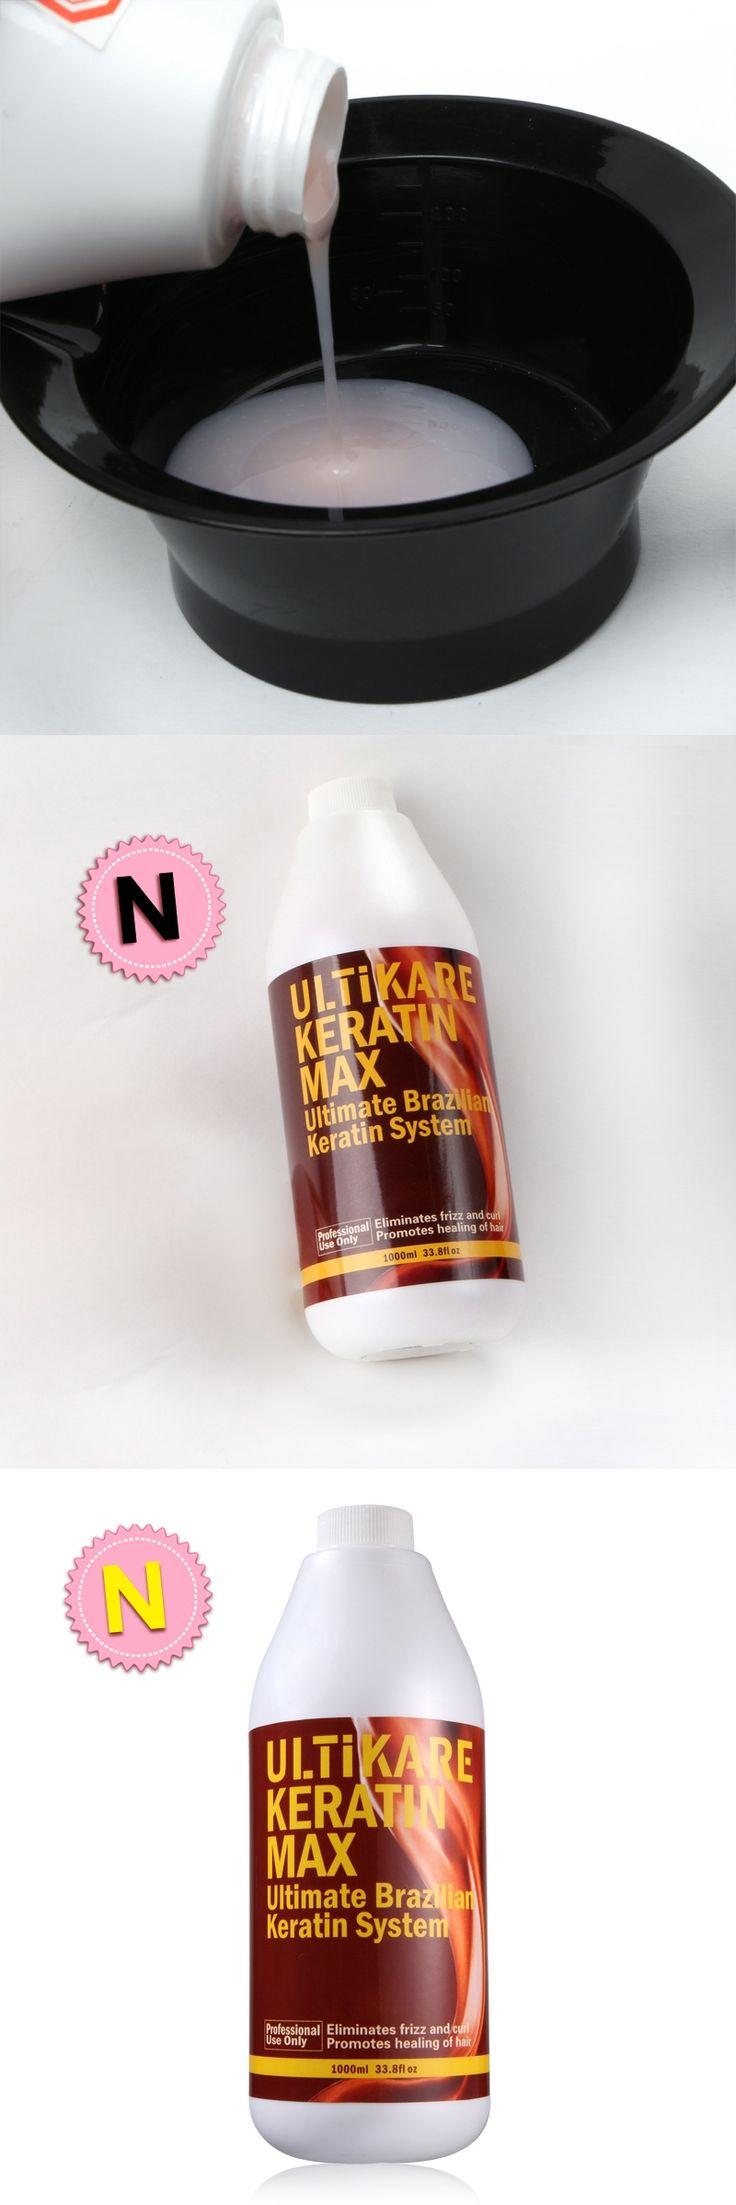 Christmas gifts Brazilian Keratin Treatment straightening 5% hair product  welocome OEM Low MOQ free shiping